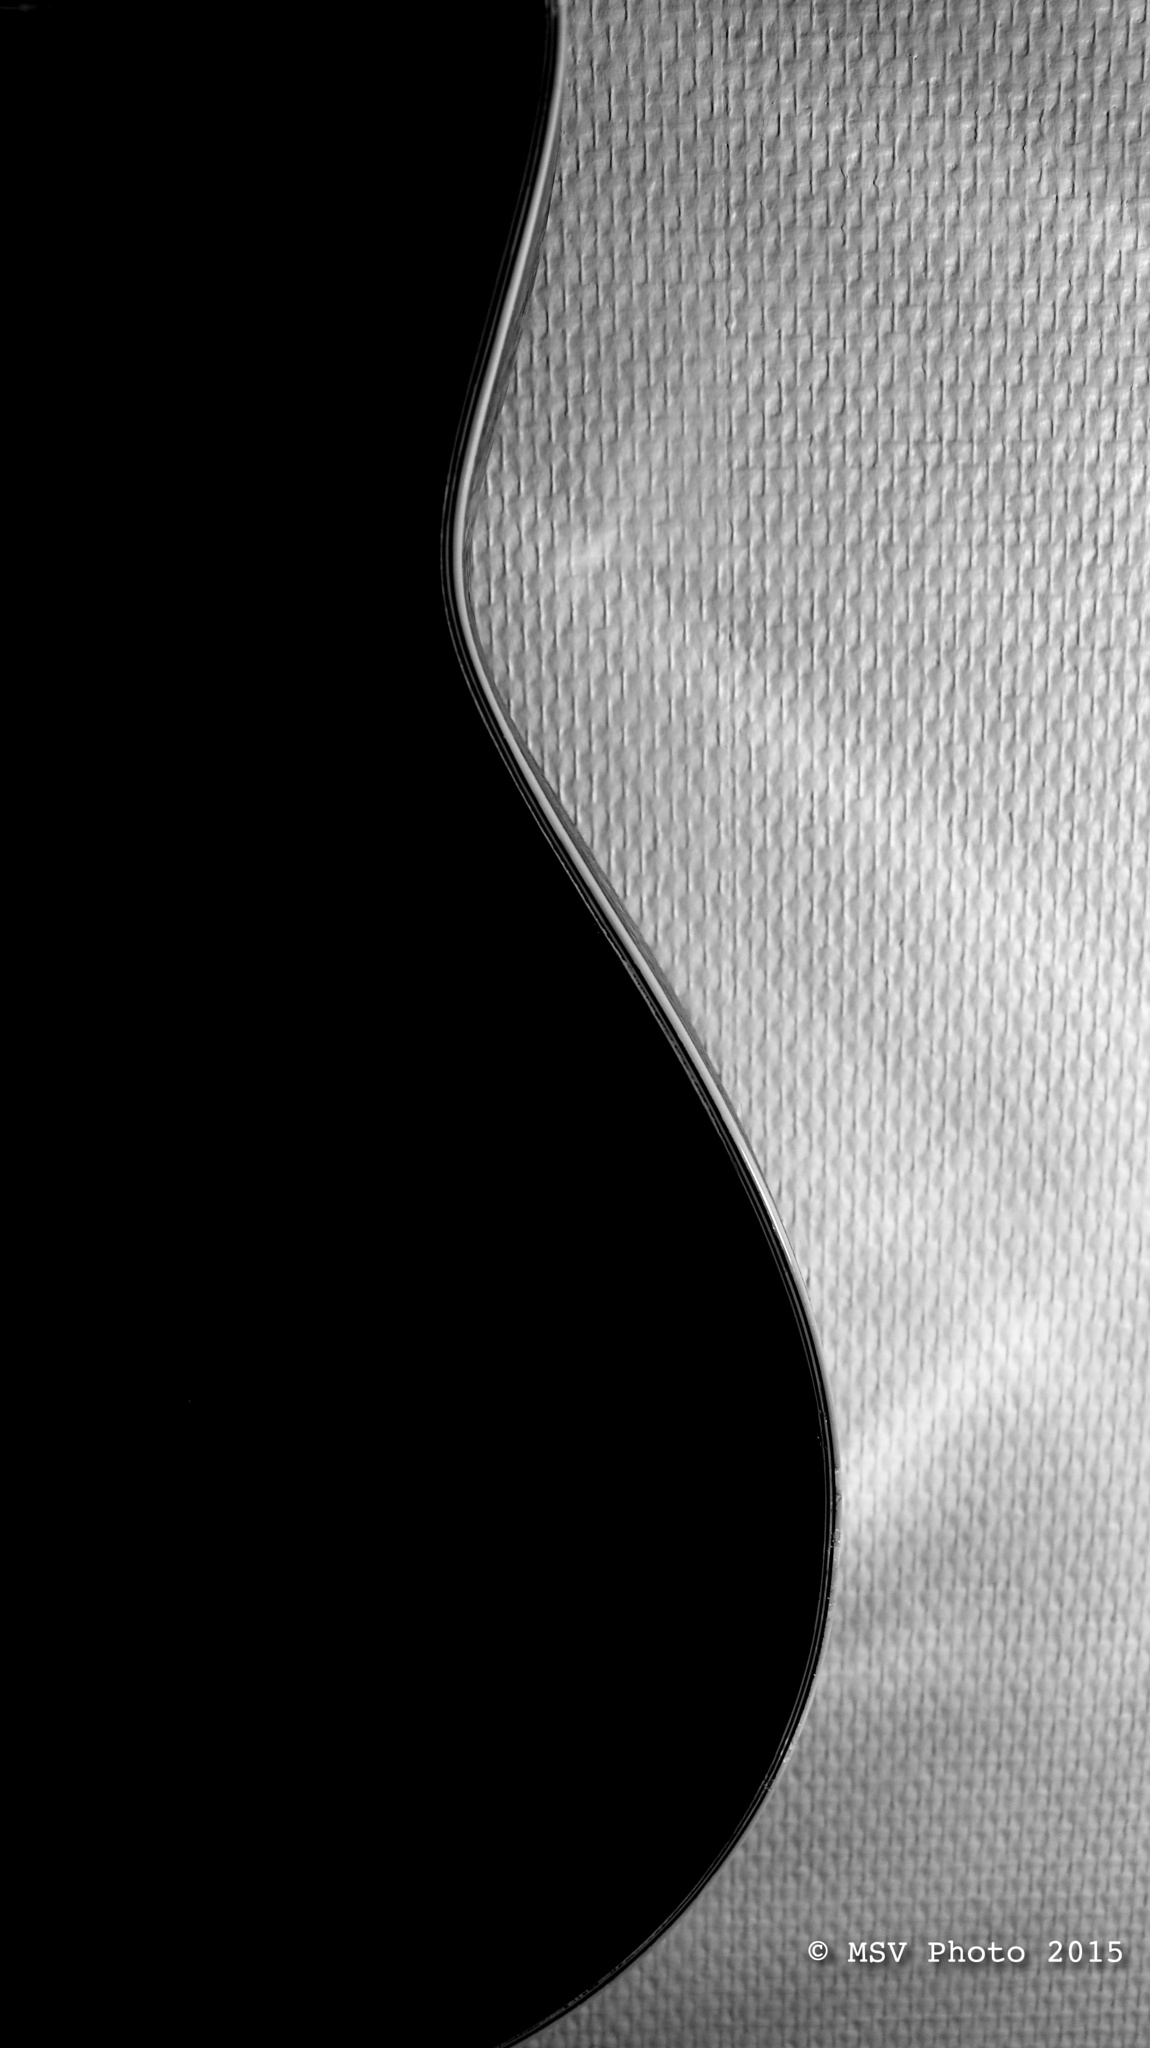 cuRve by Matti S Viitala